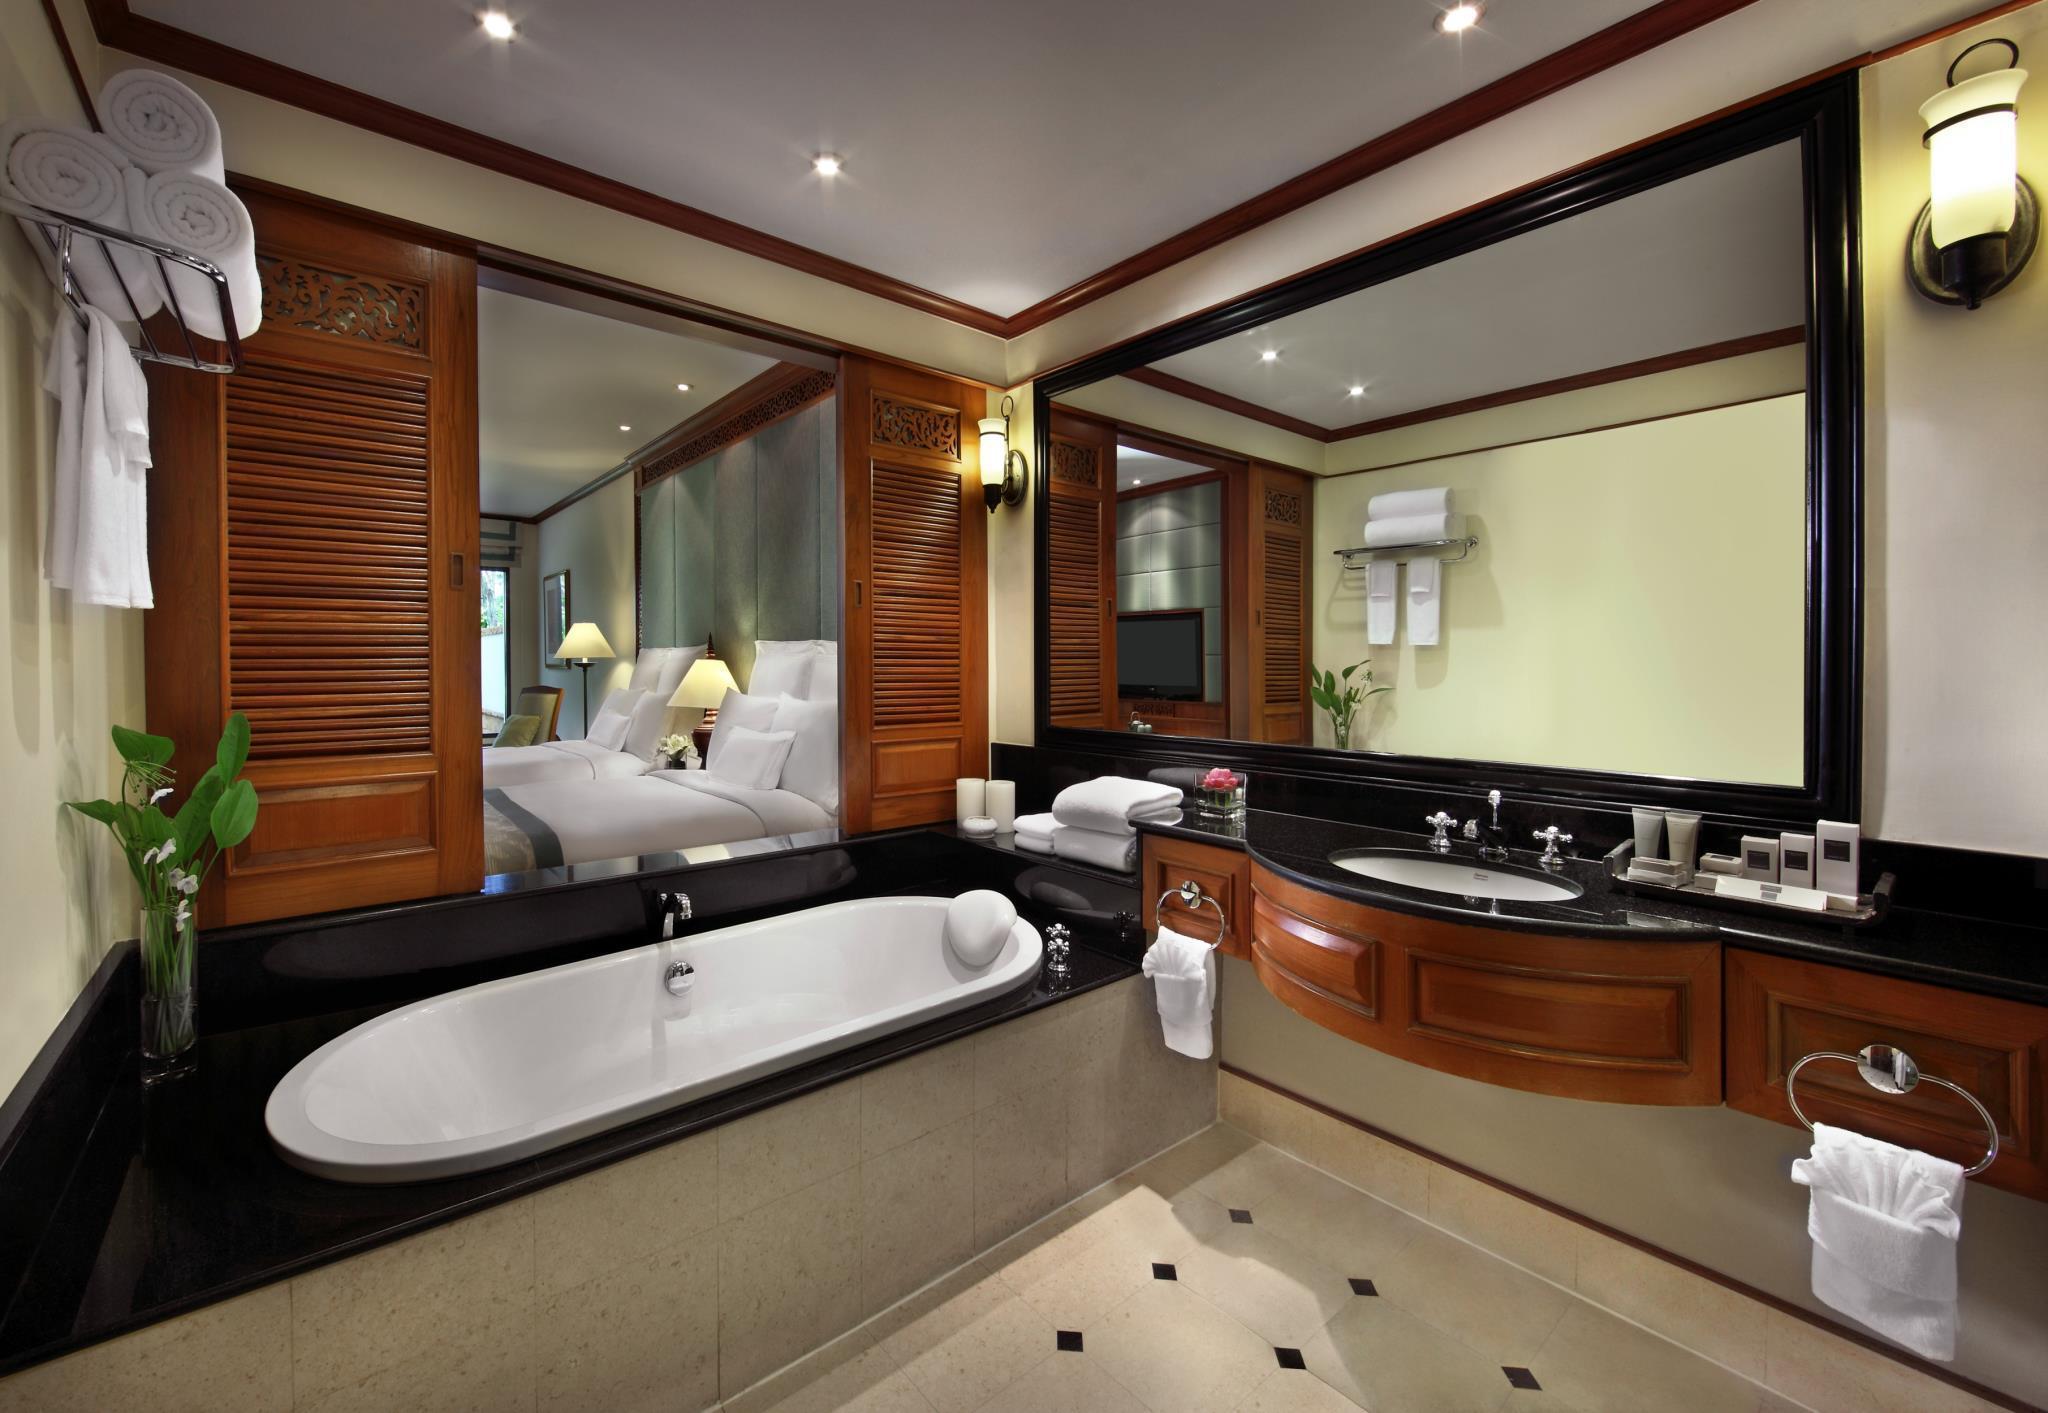 JW Marriott Phuket Resort & Spa เจดับบลิว แมริออท ภูเก็ต รีสอร์ต แอนด์ สปา